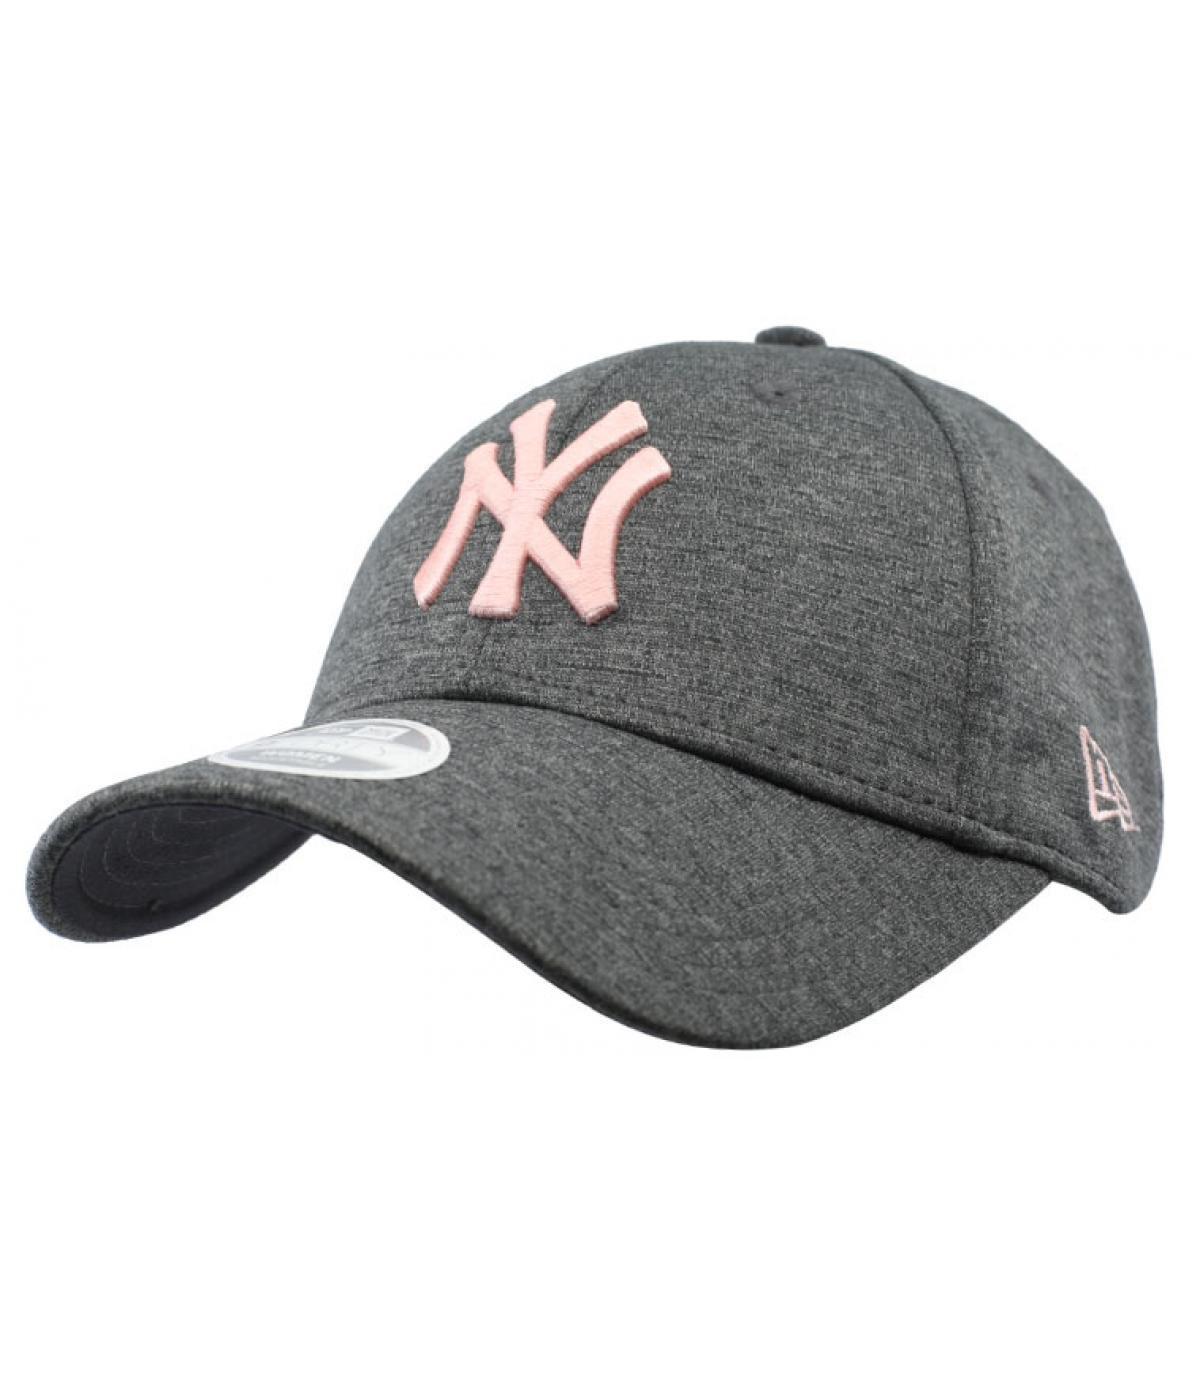 Detalles Cap NY Woman Tech Jersey gray pink imagen 2